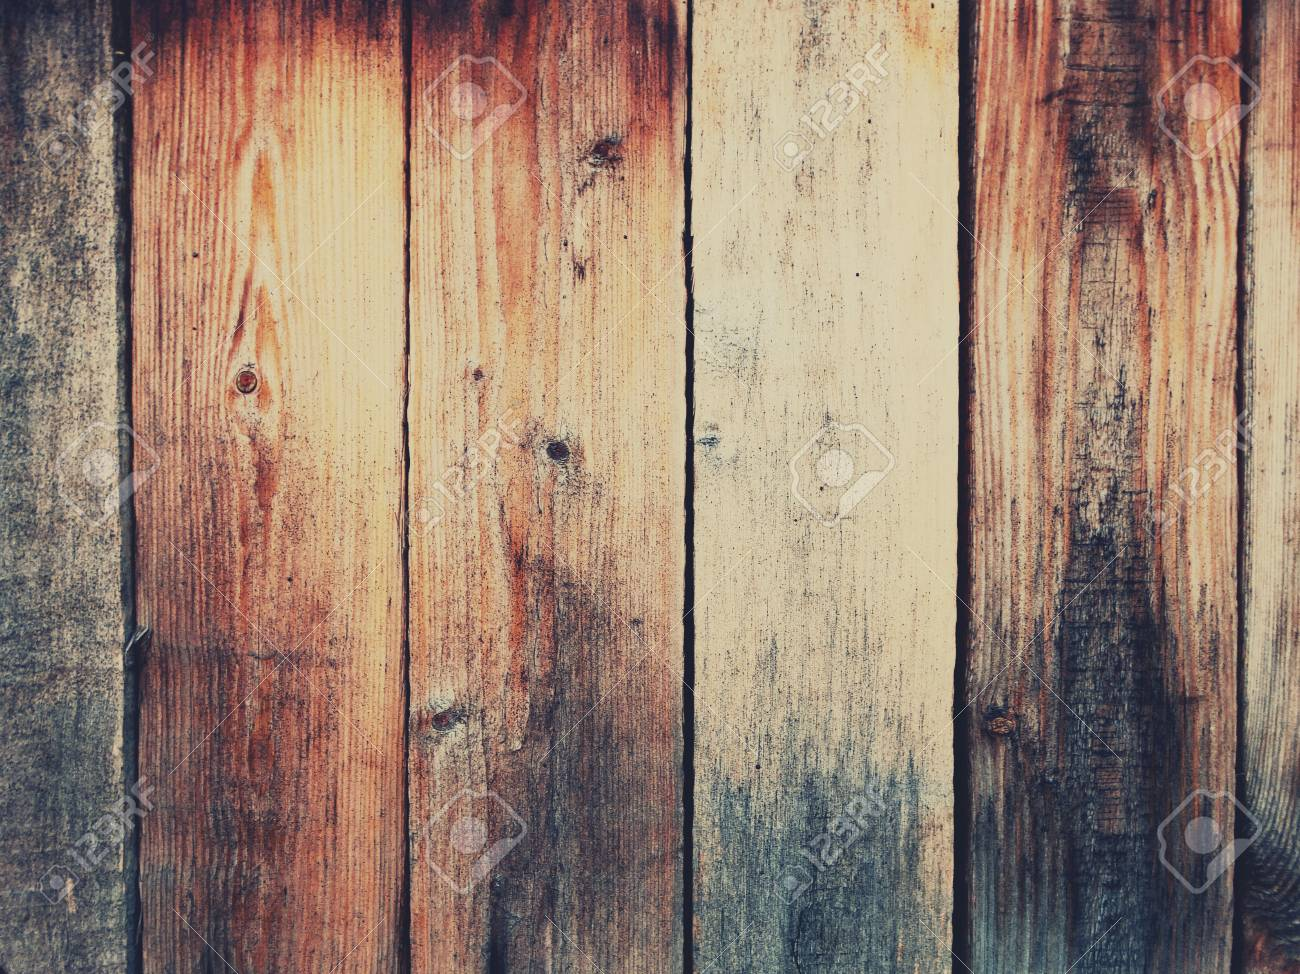 Wood Texture Background Nature Wallpaper Vintage Retro